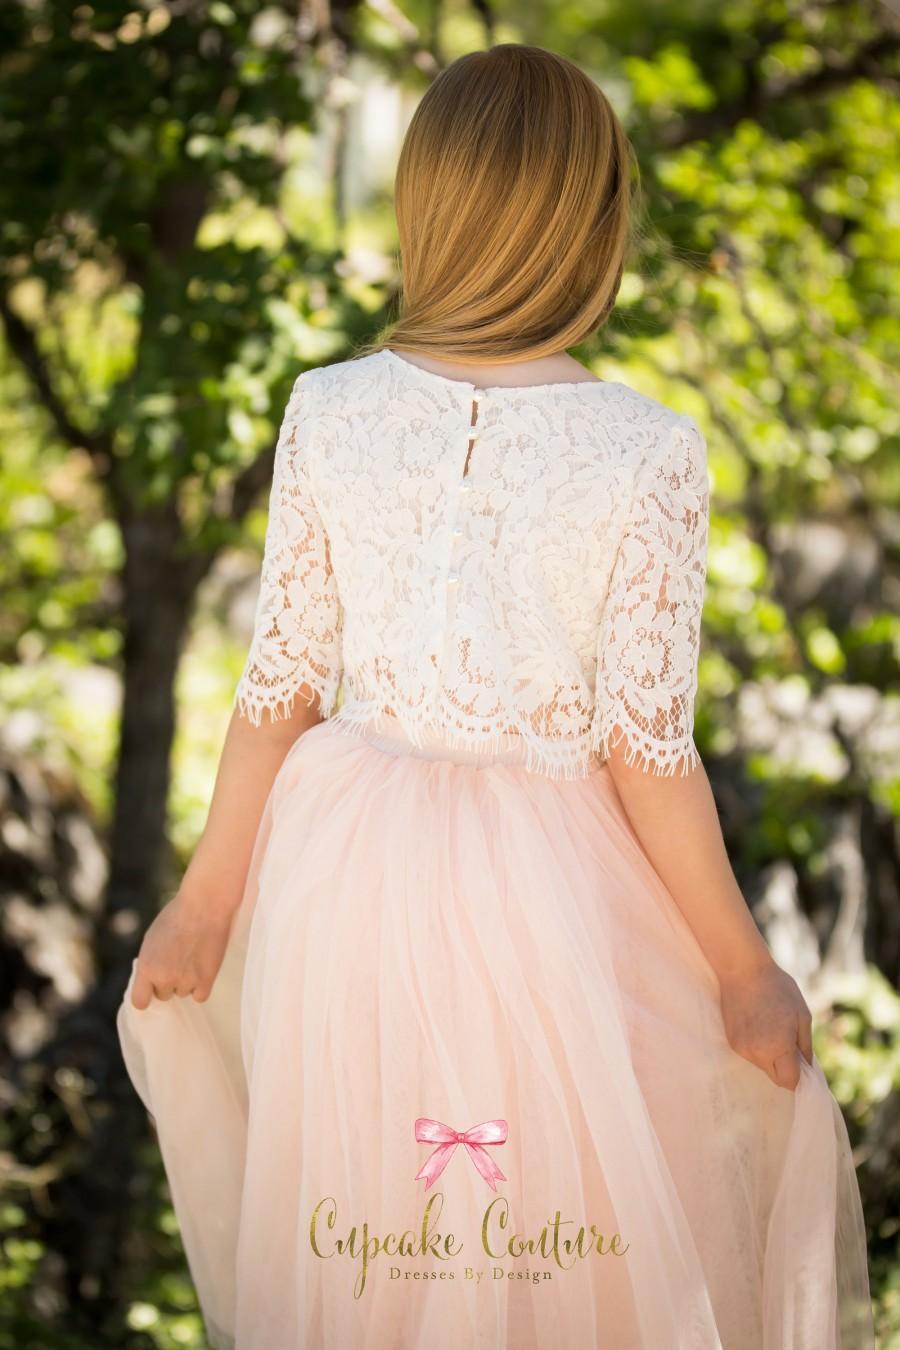 Mariage - Blush flower girl dress, toddler flower girl dress, tulle flower girl dress, long sleeve flower girl dress, flower girl dress